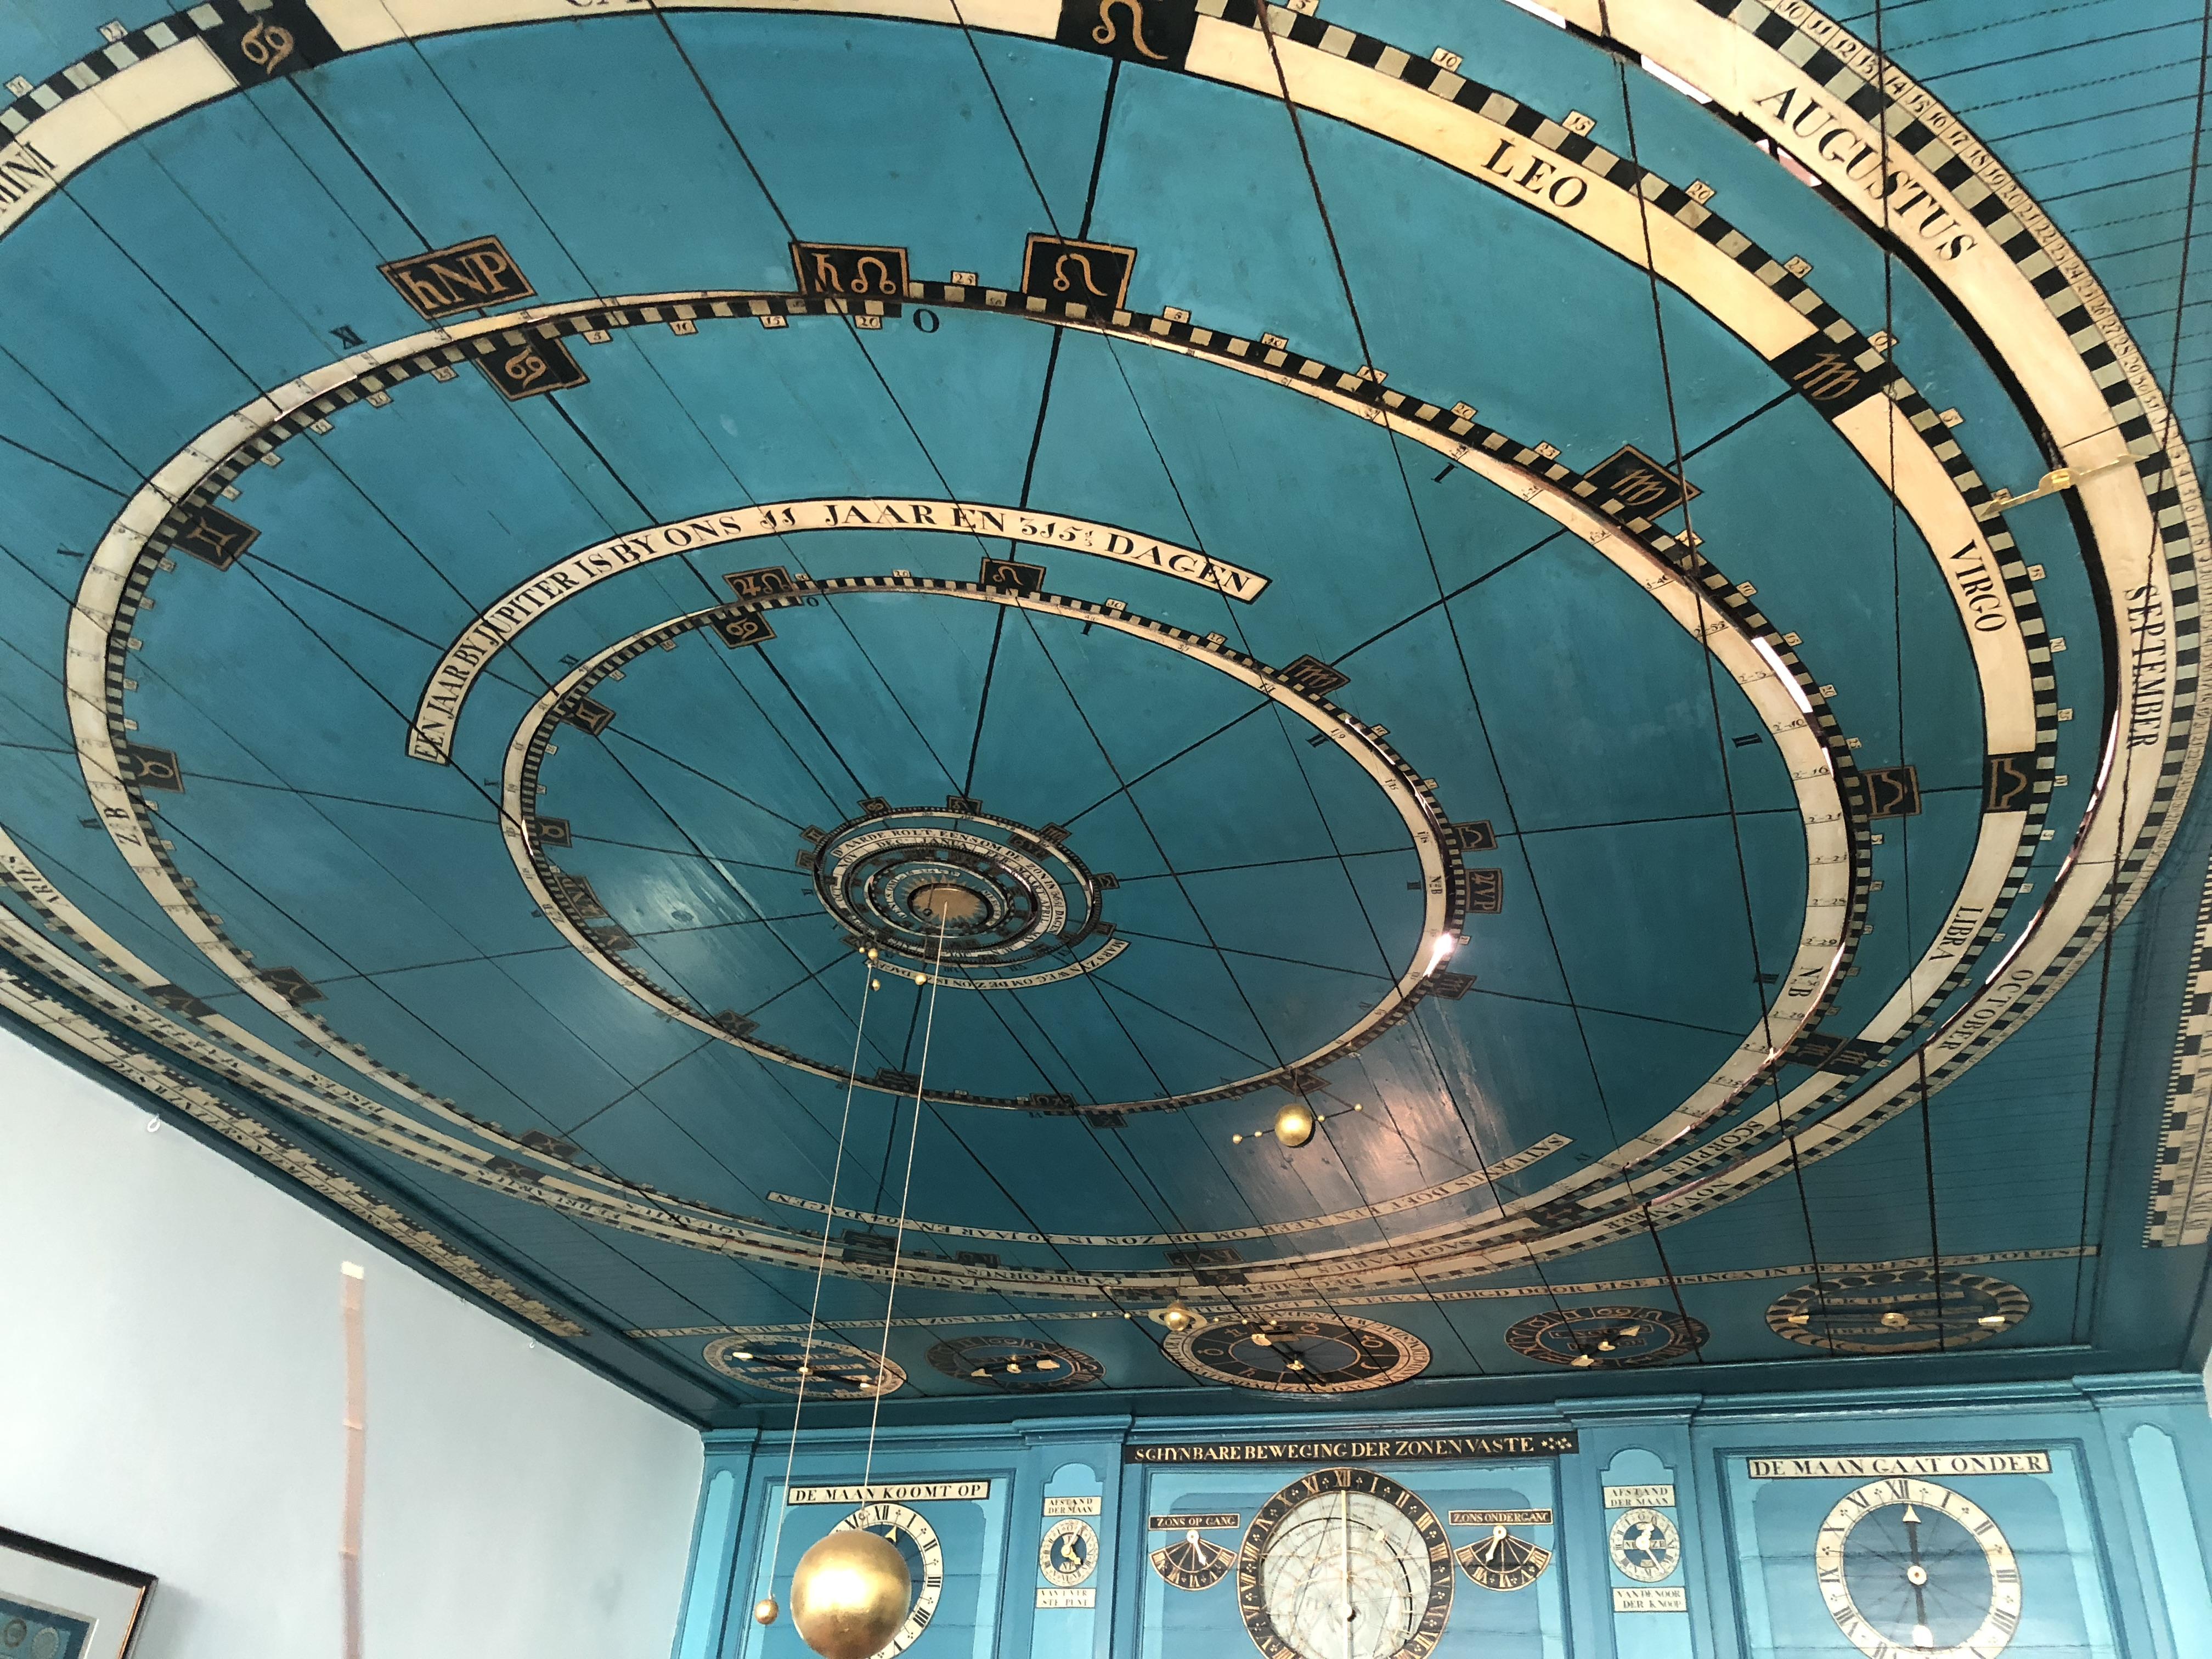 Planetarium-Eise-Eisinga-in-Franeker-omgeving-makkum